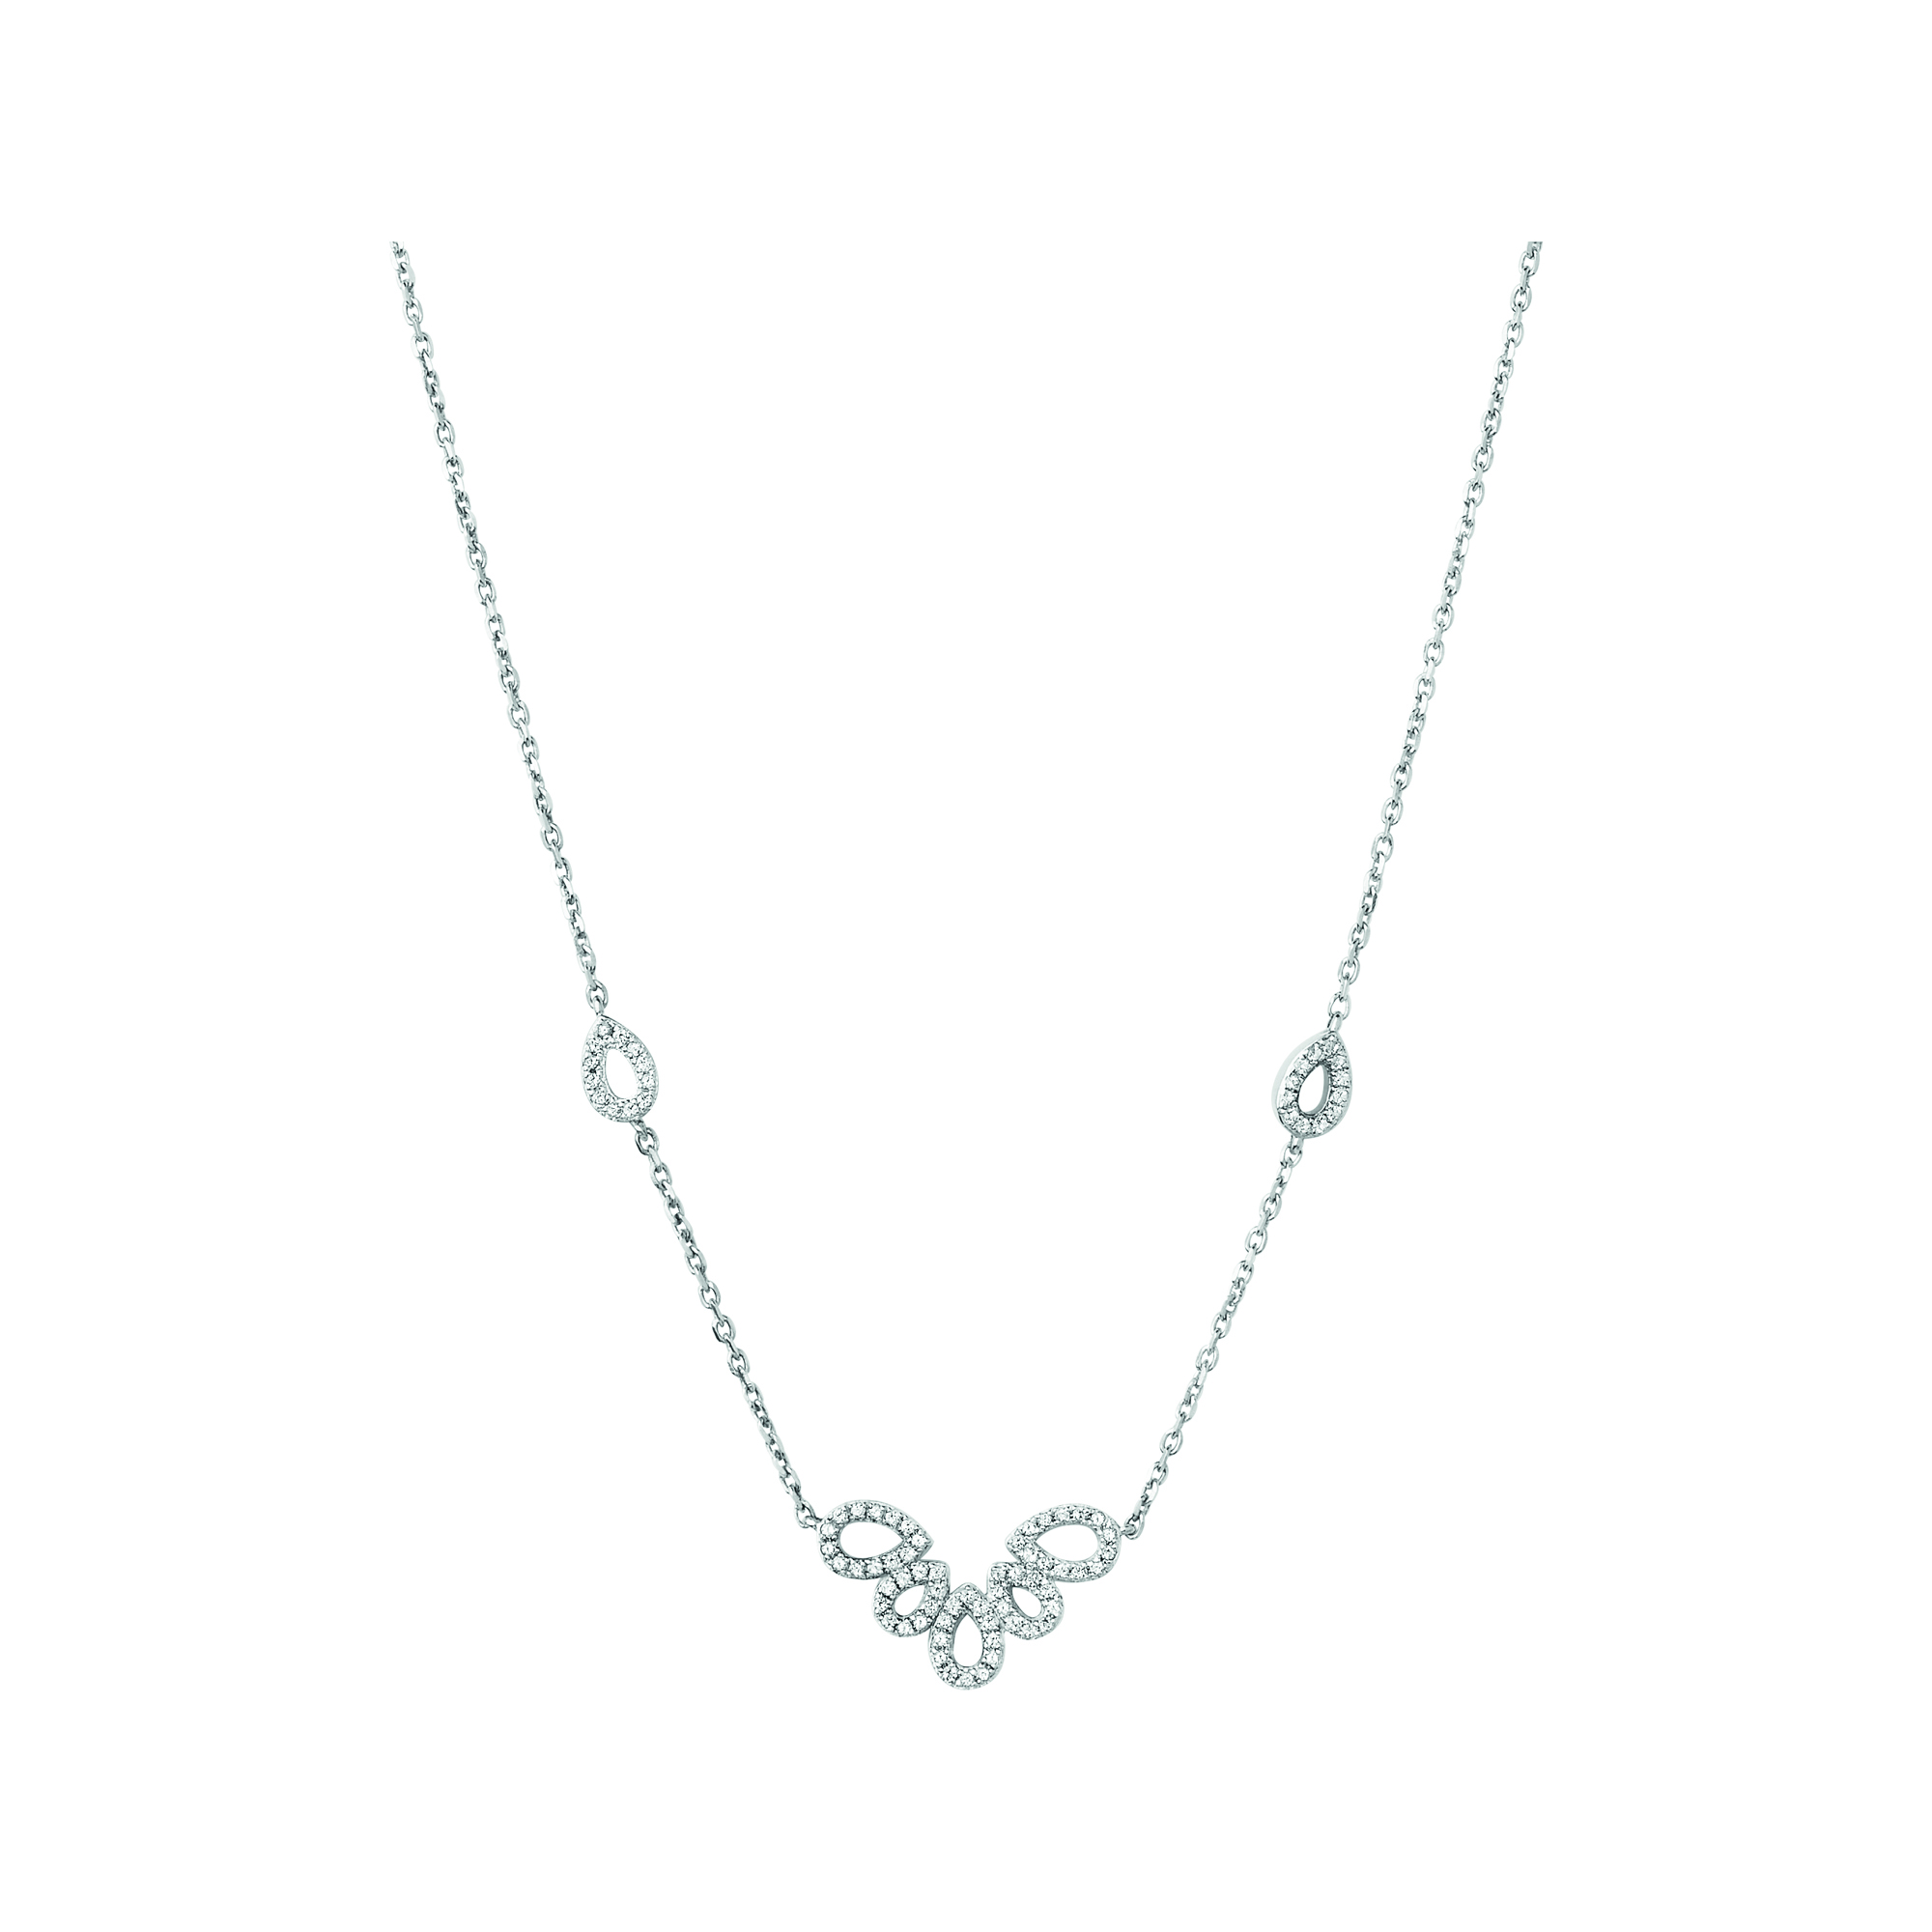 LINKS OF LONDON - Ασημένιο κολιέ Outlet Peardrops γυναικεία αξεσουάρ κοσμήματα κολιέ